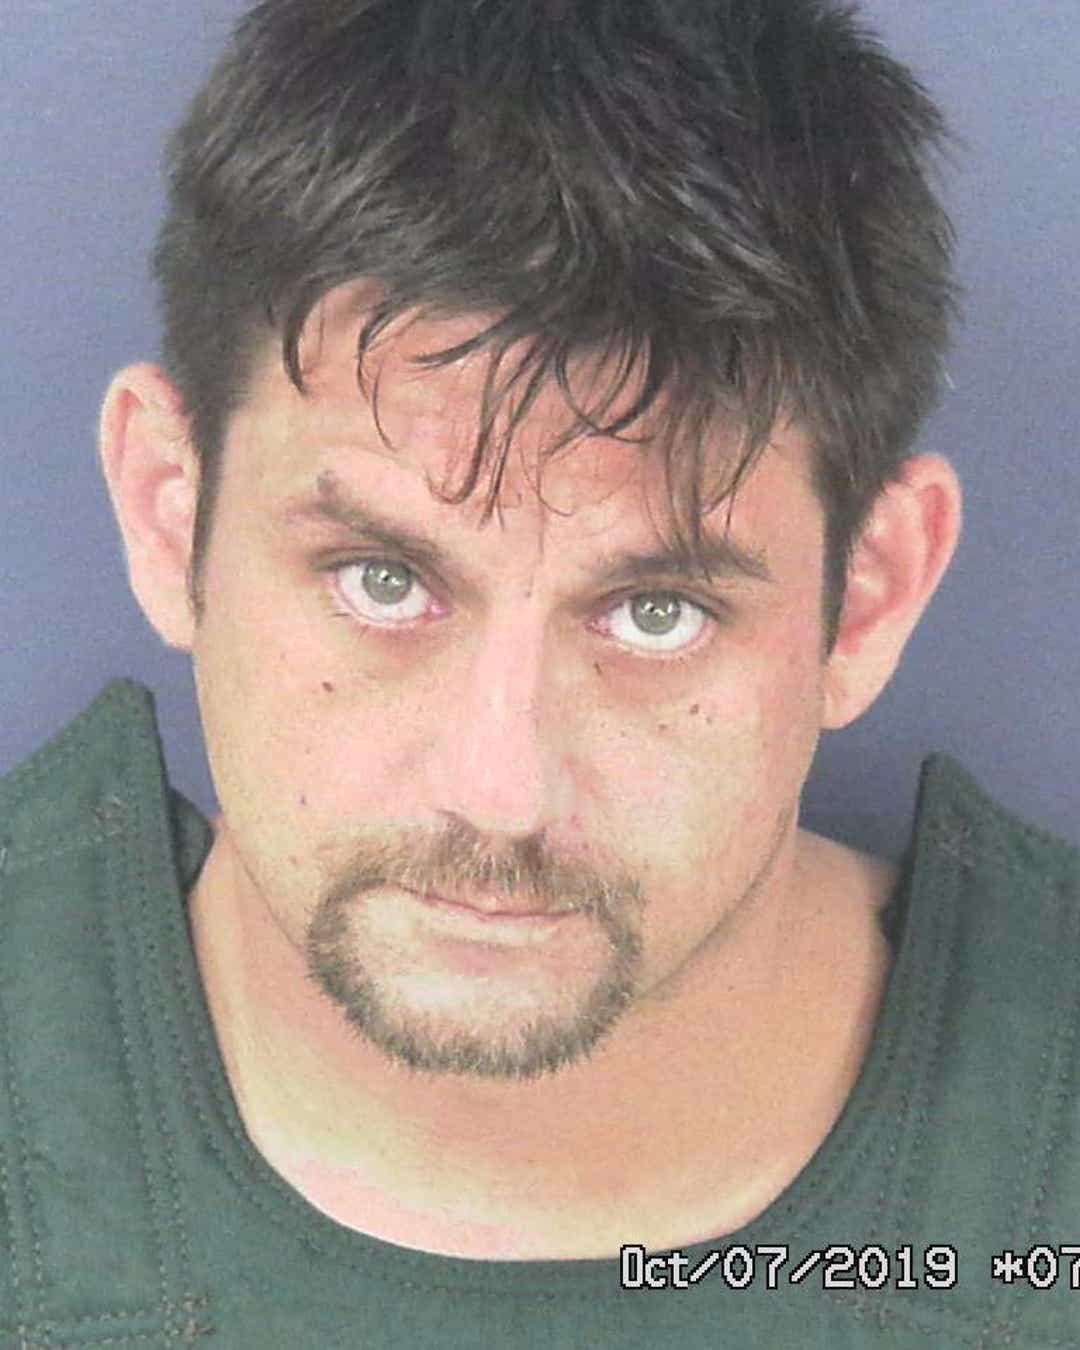 Teen arrested after allegedly running over Orange County